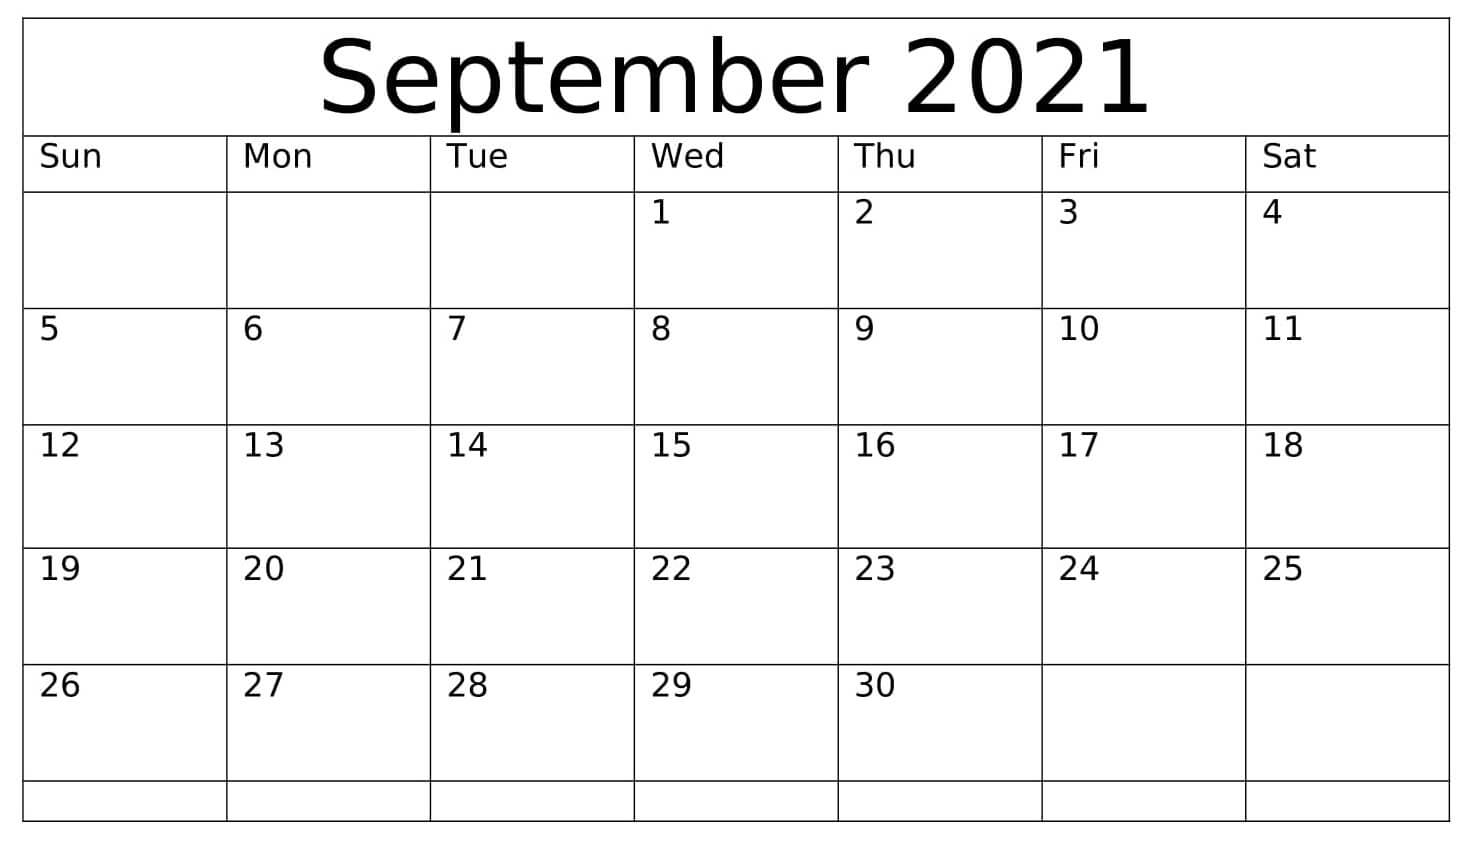 Print September 2021 Calendar A4 Size Landscape Format